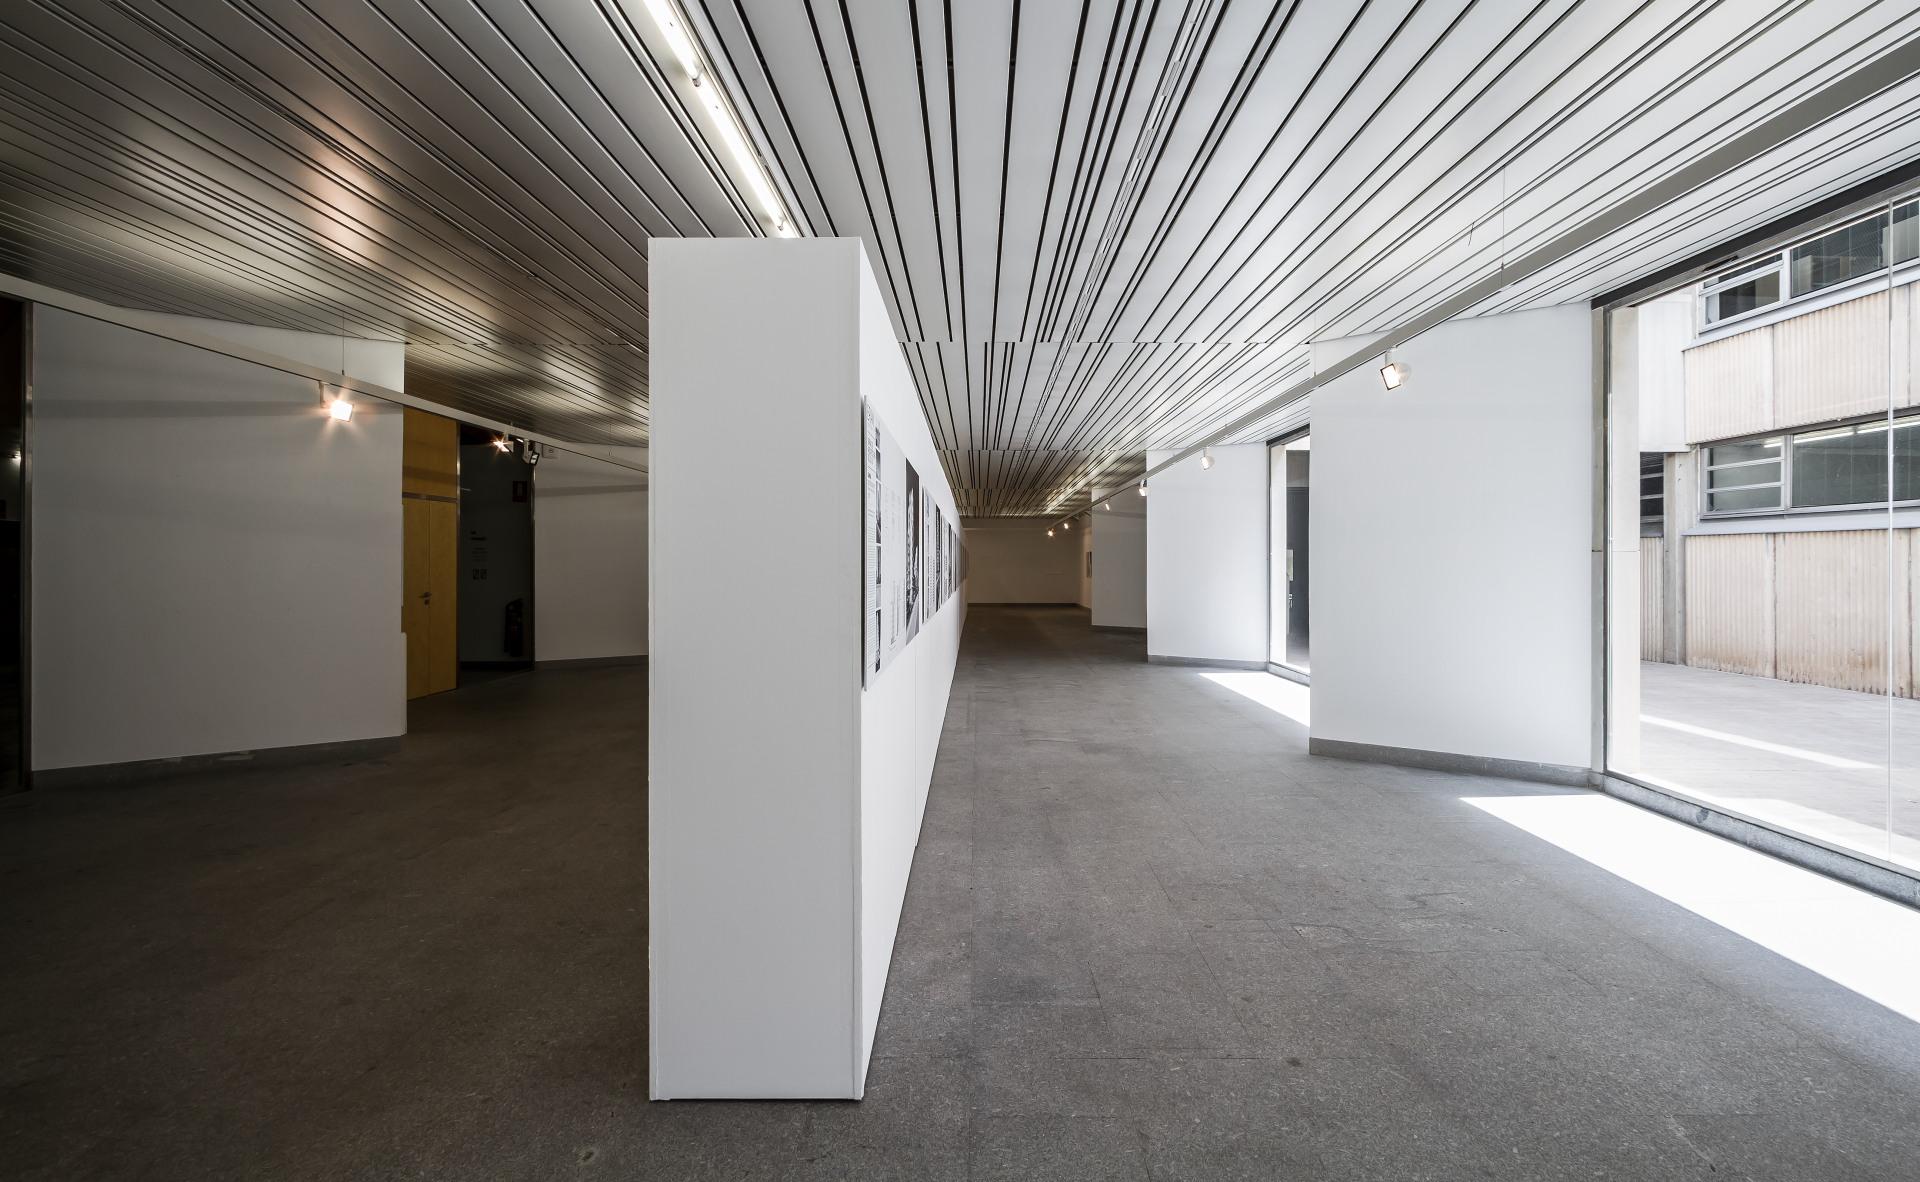 fotografia-arquitectura-valencia-german-cabo-upv-etsav-eram-exposicion (5)